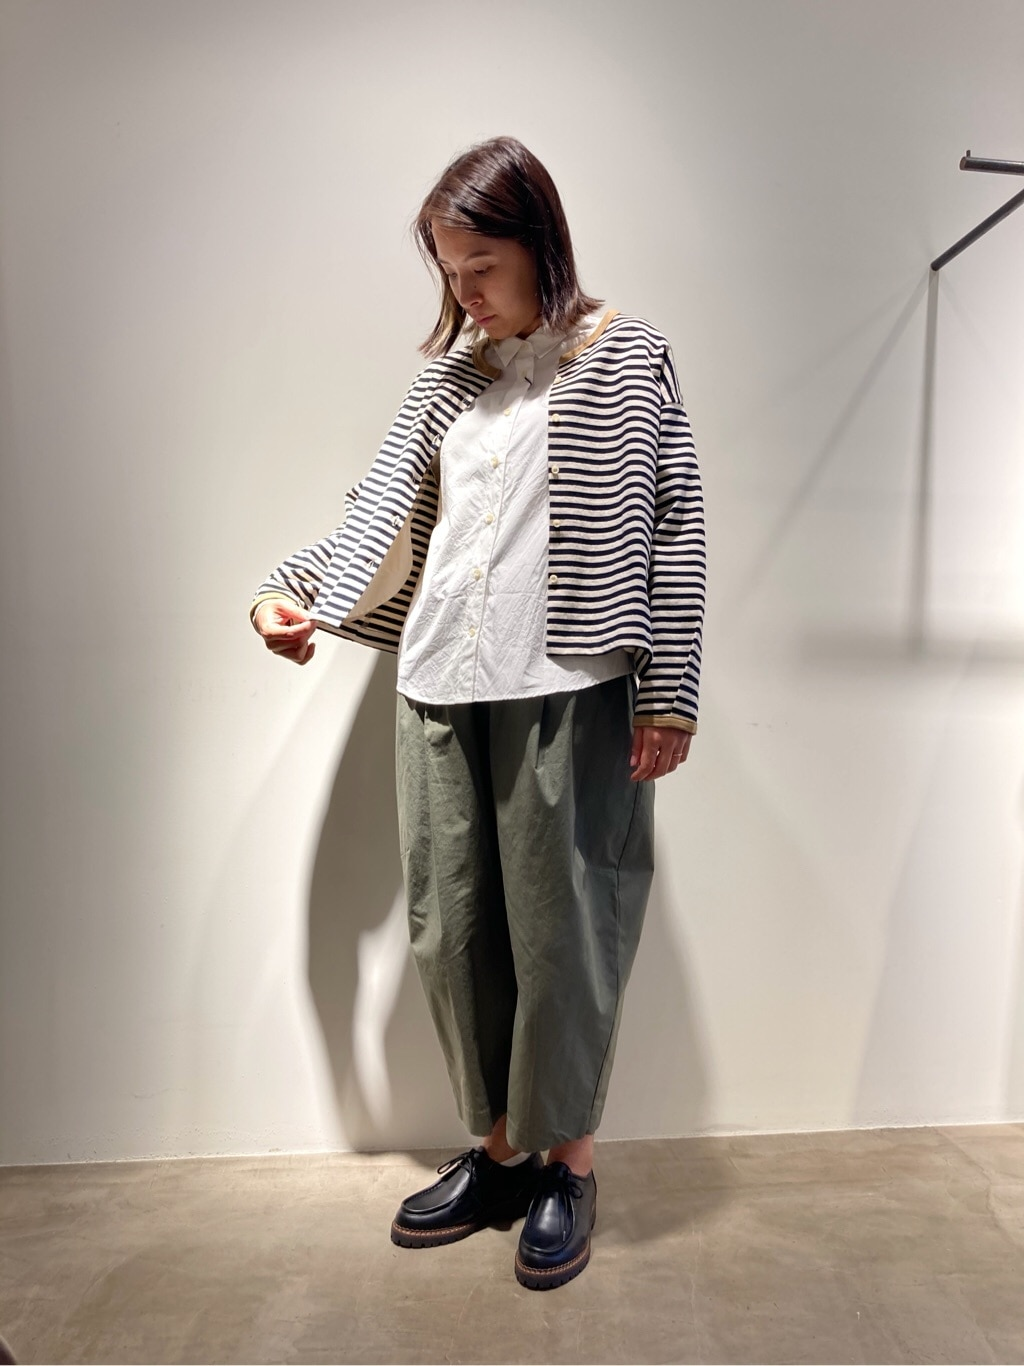 yuni / bulle de savon 京都路面 身長:157cm 2020.09.02